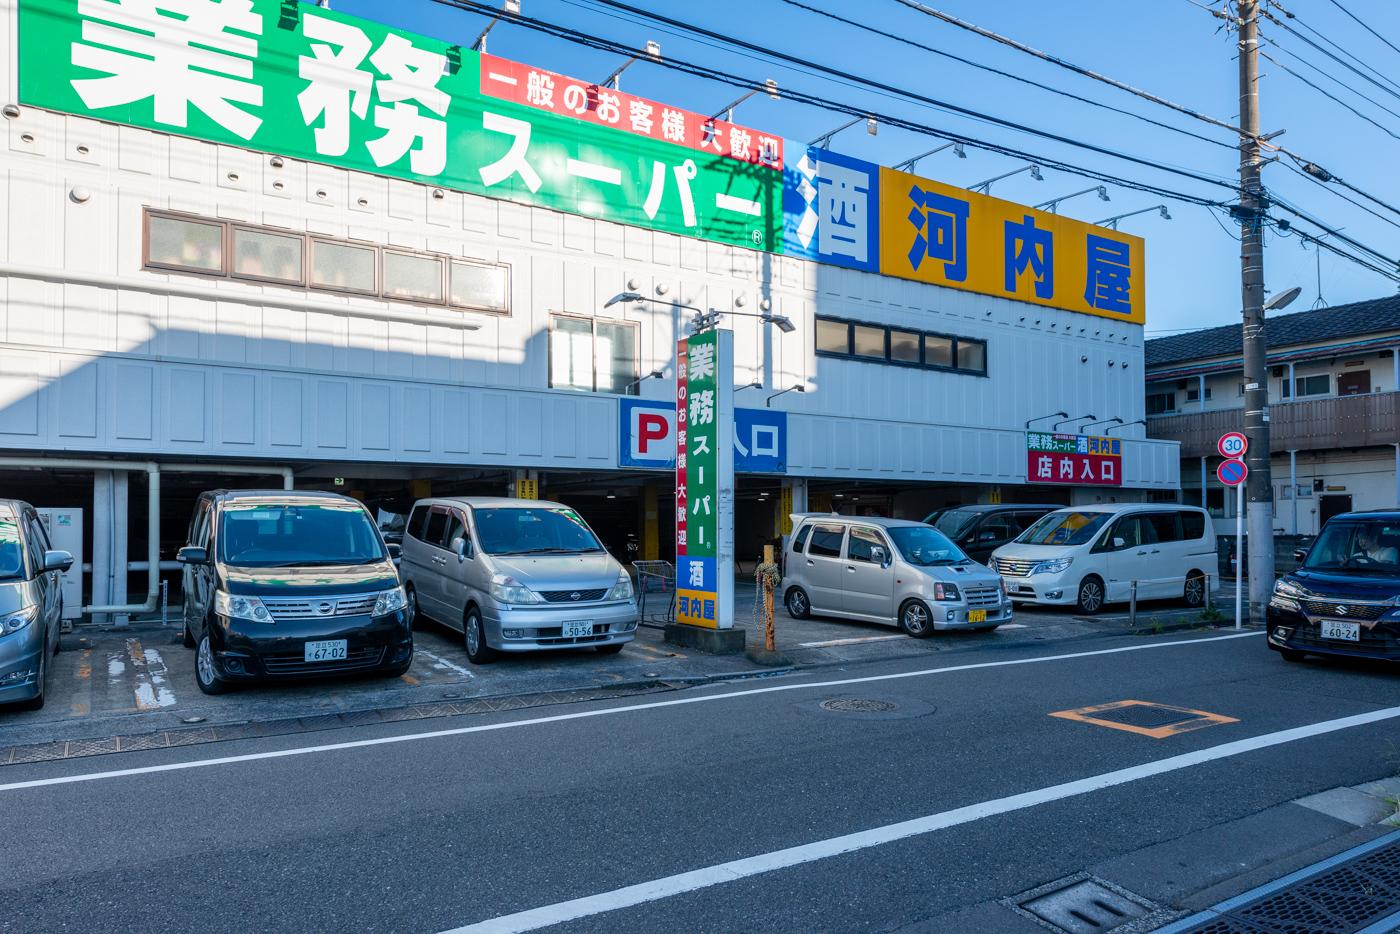 業務スーパー立石店 (300m)